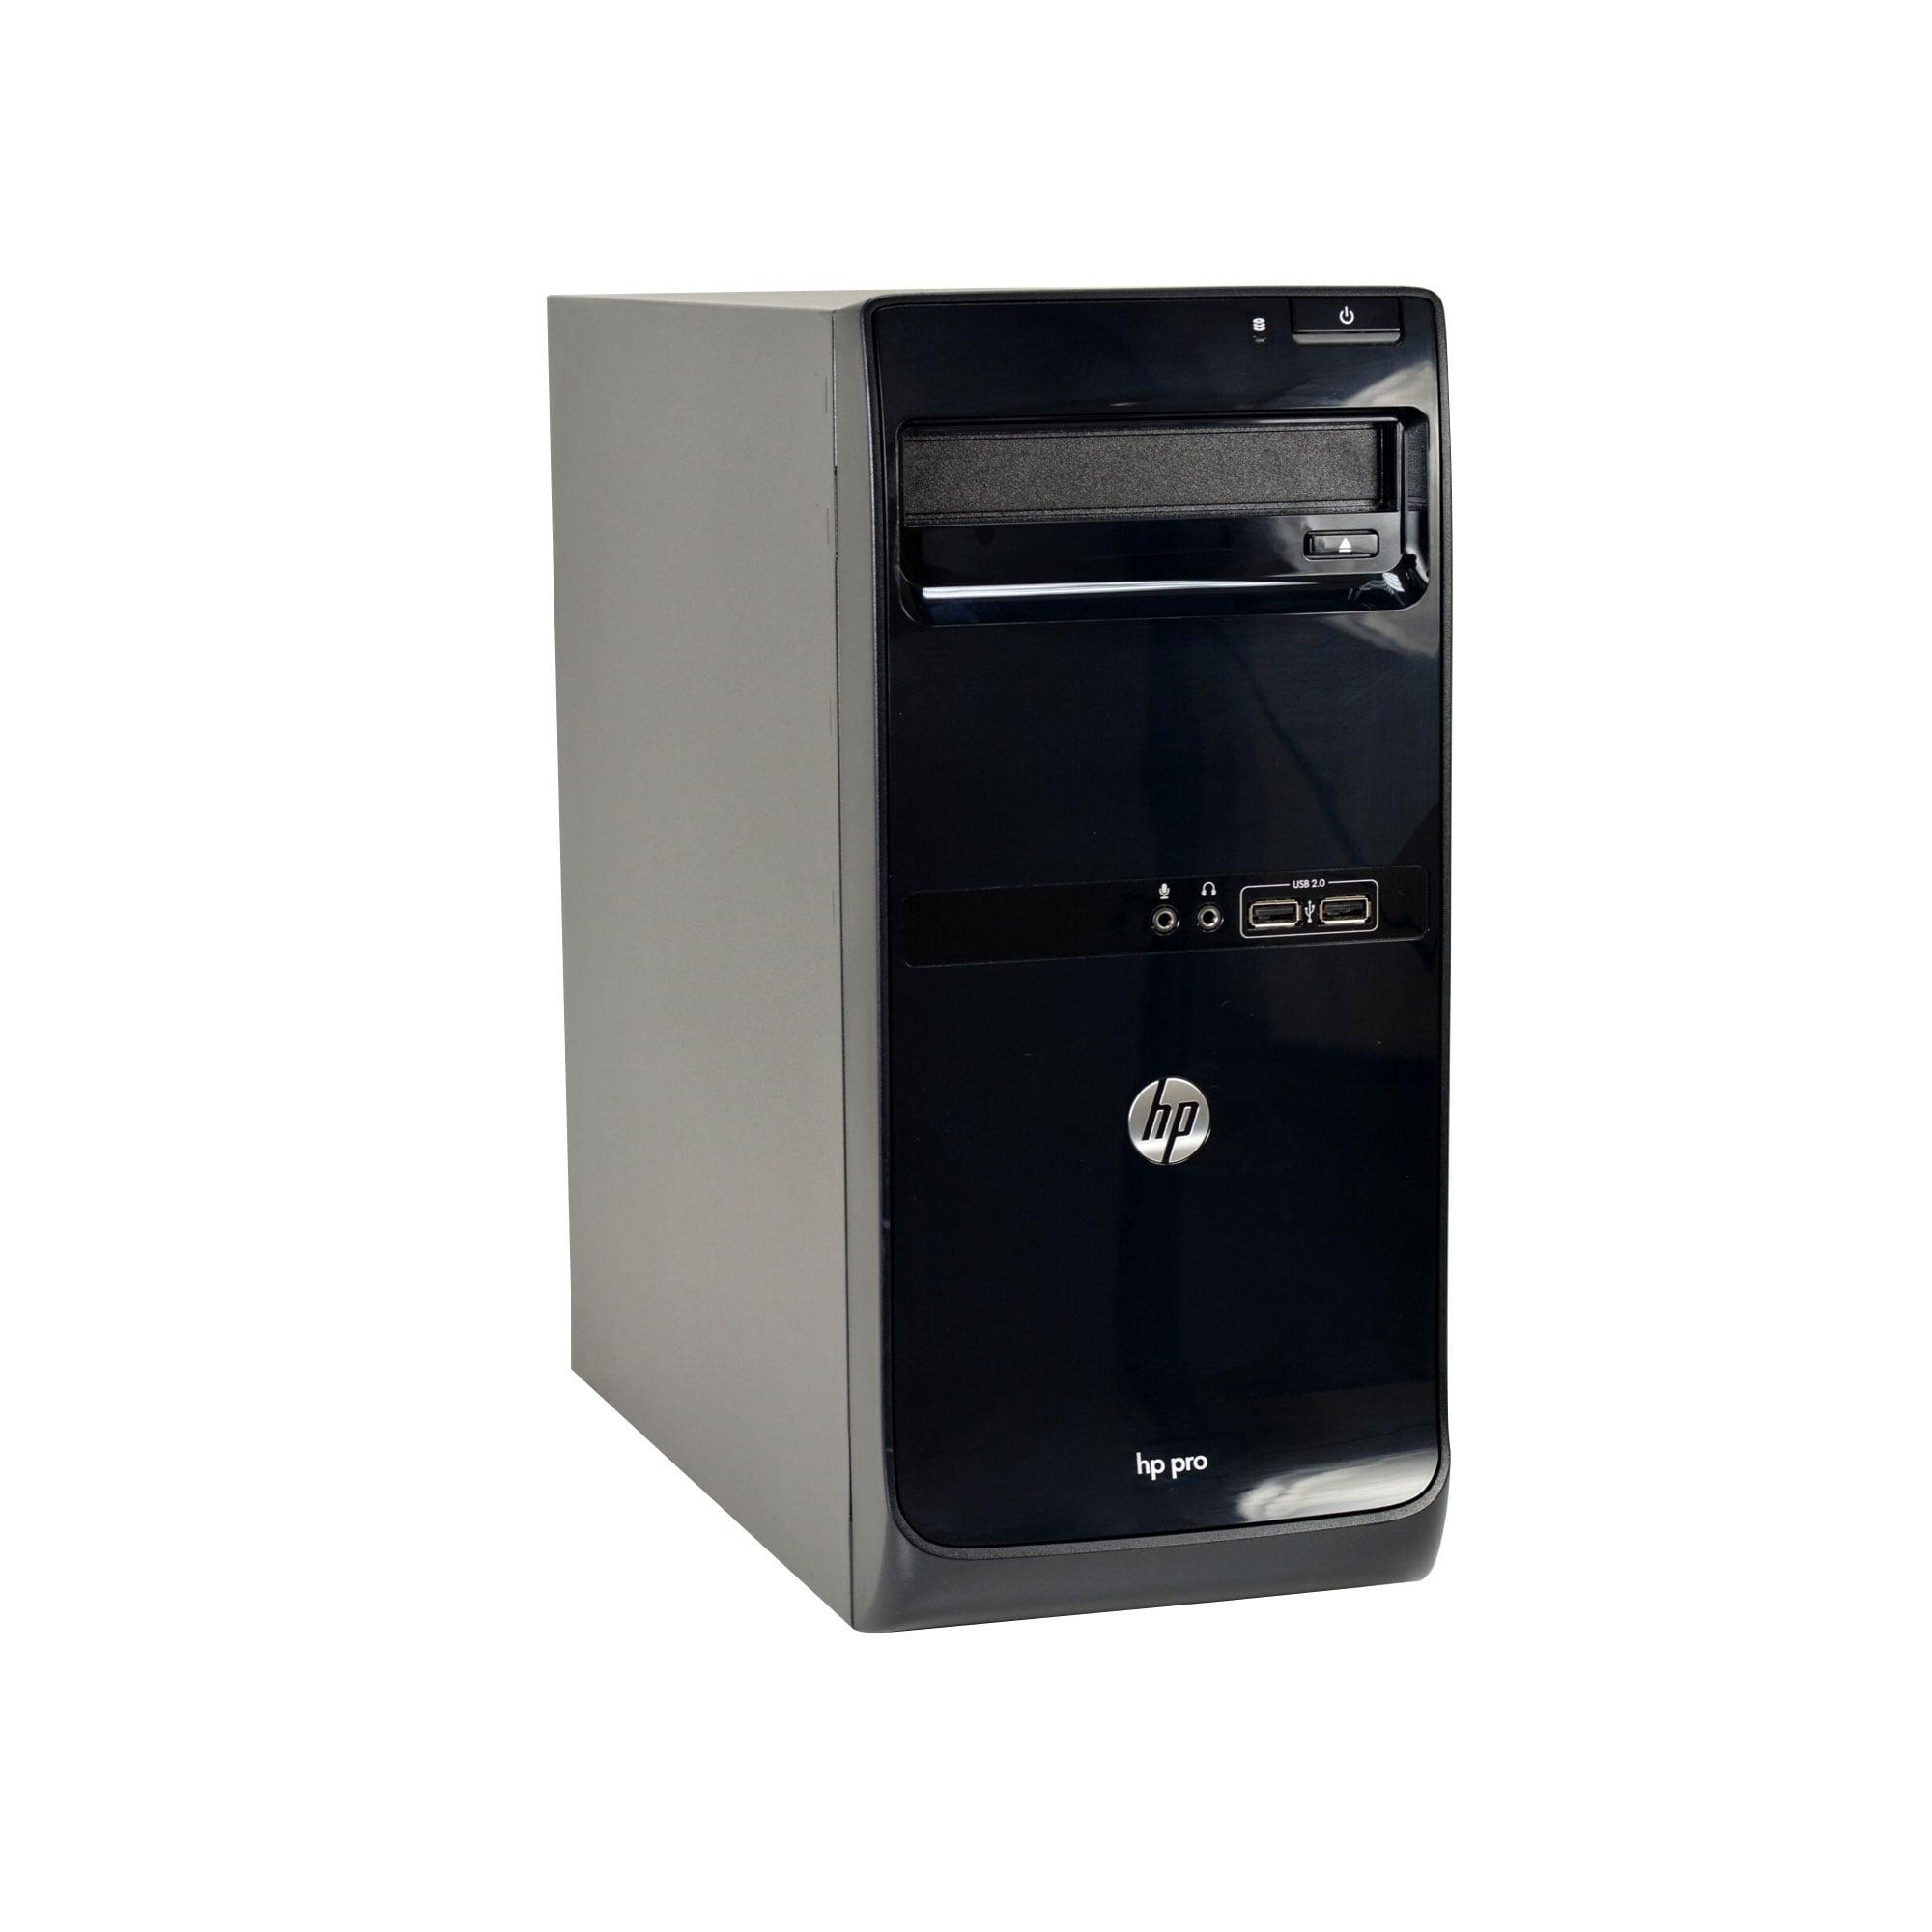 HP Pro 3500-T Core i5-3570 3 4GHz CPU 8GB RAM 500GB HDD DVD-RW Windows 10  Pro PC (Refurbished)